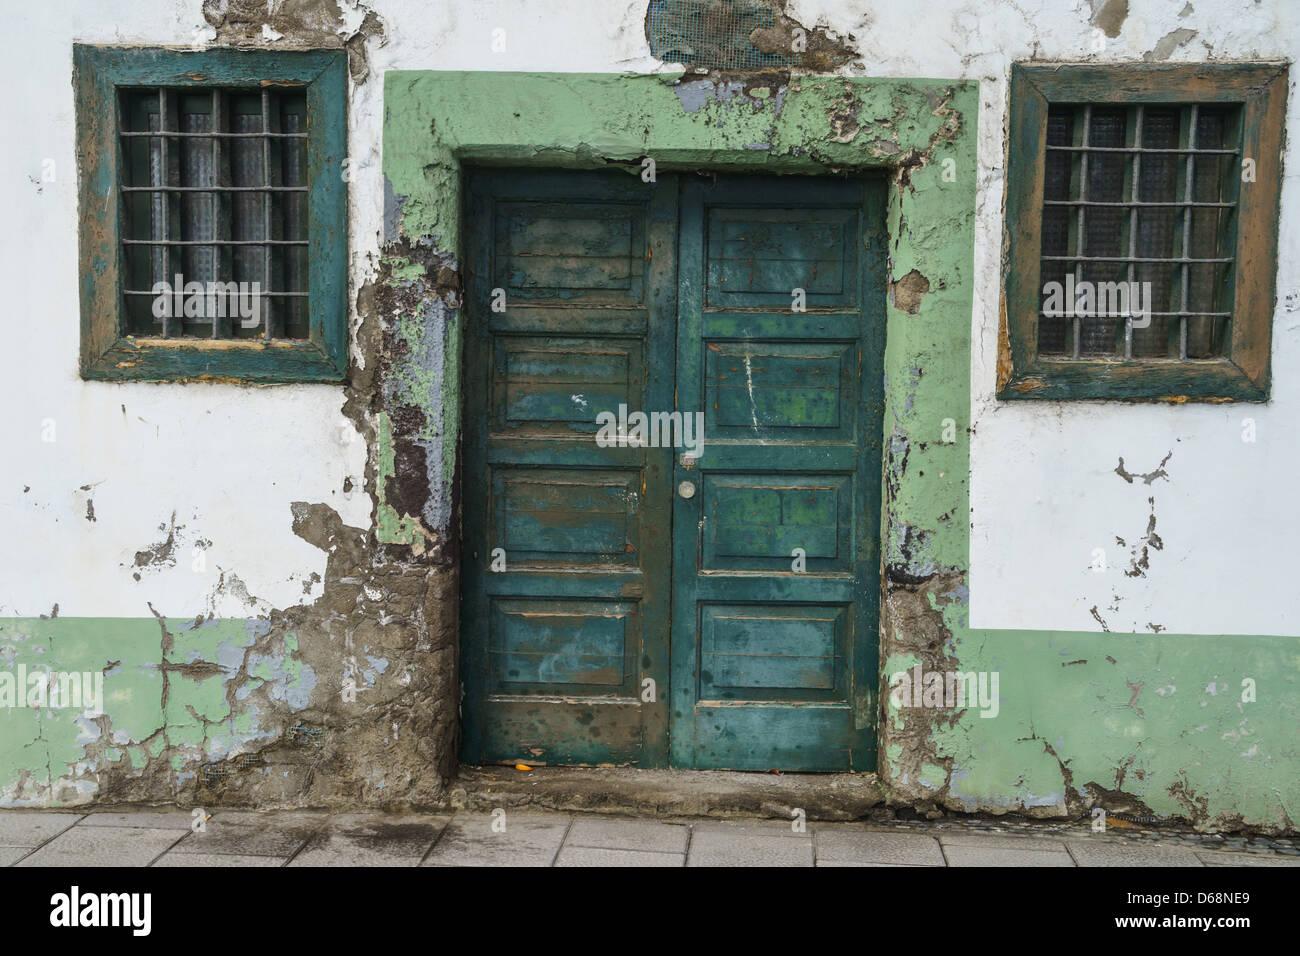 La Palma, Canary Islands - Santa Cruz, island capital. Weather erods old stone and plaster house. - Stock Image